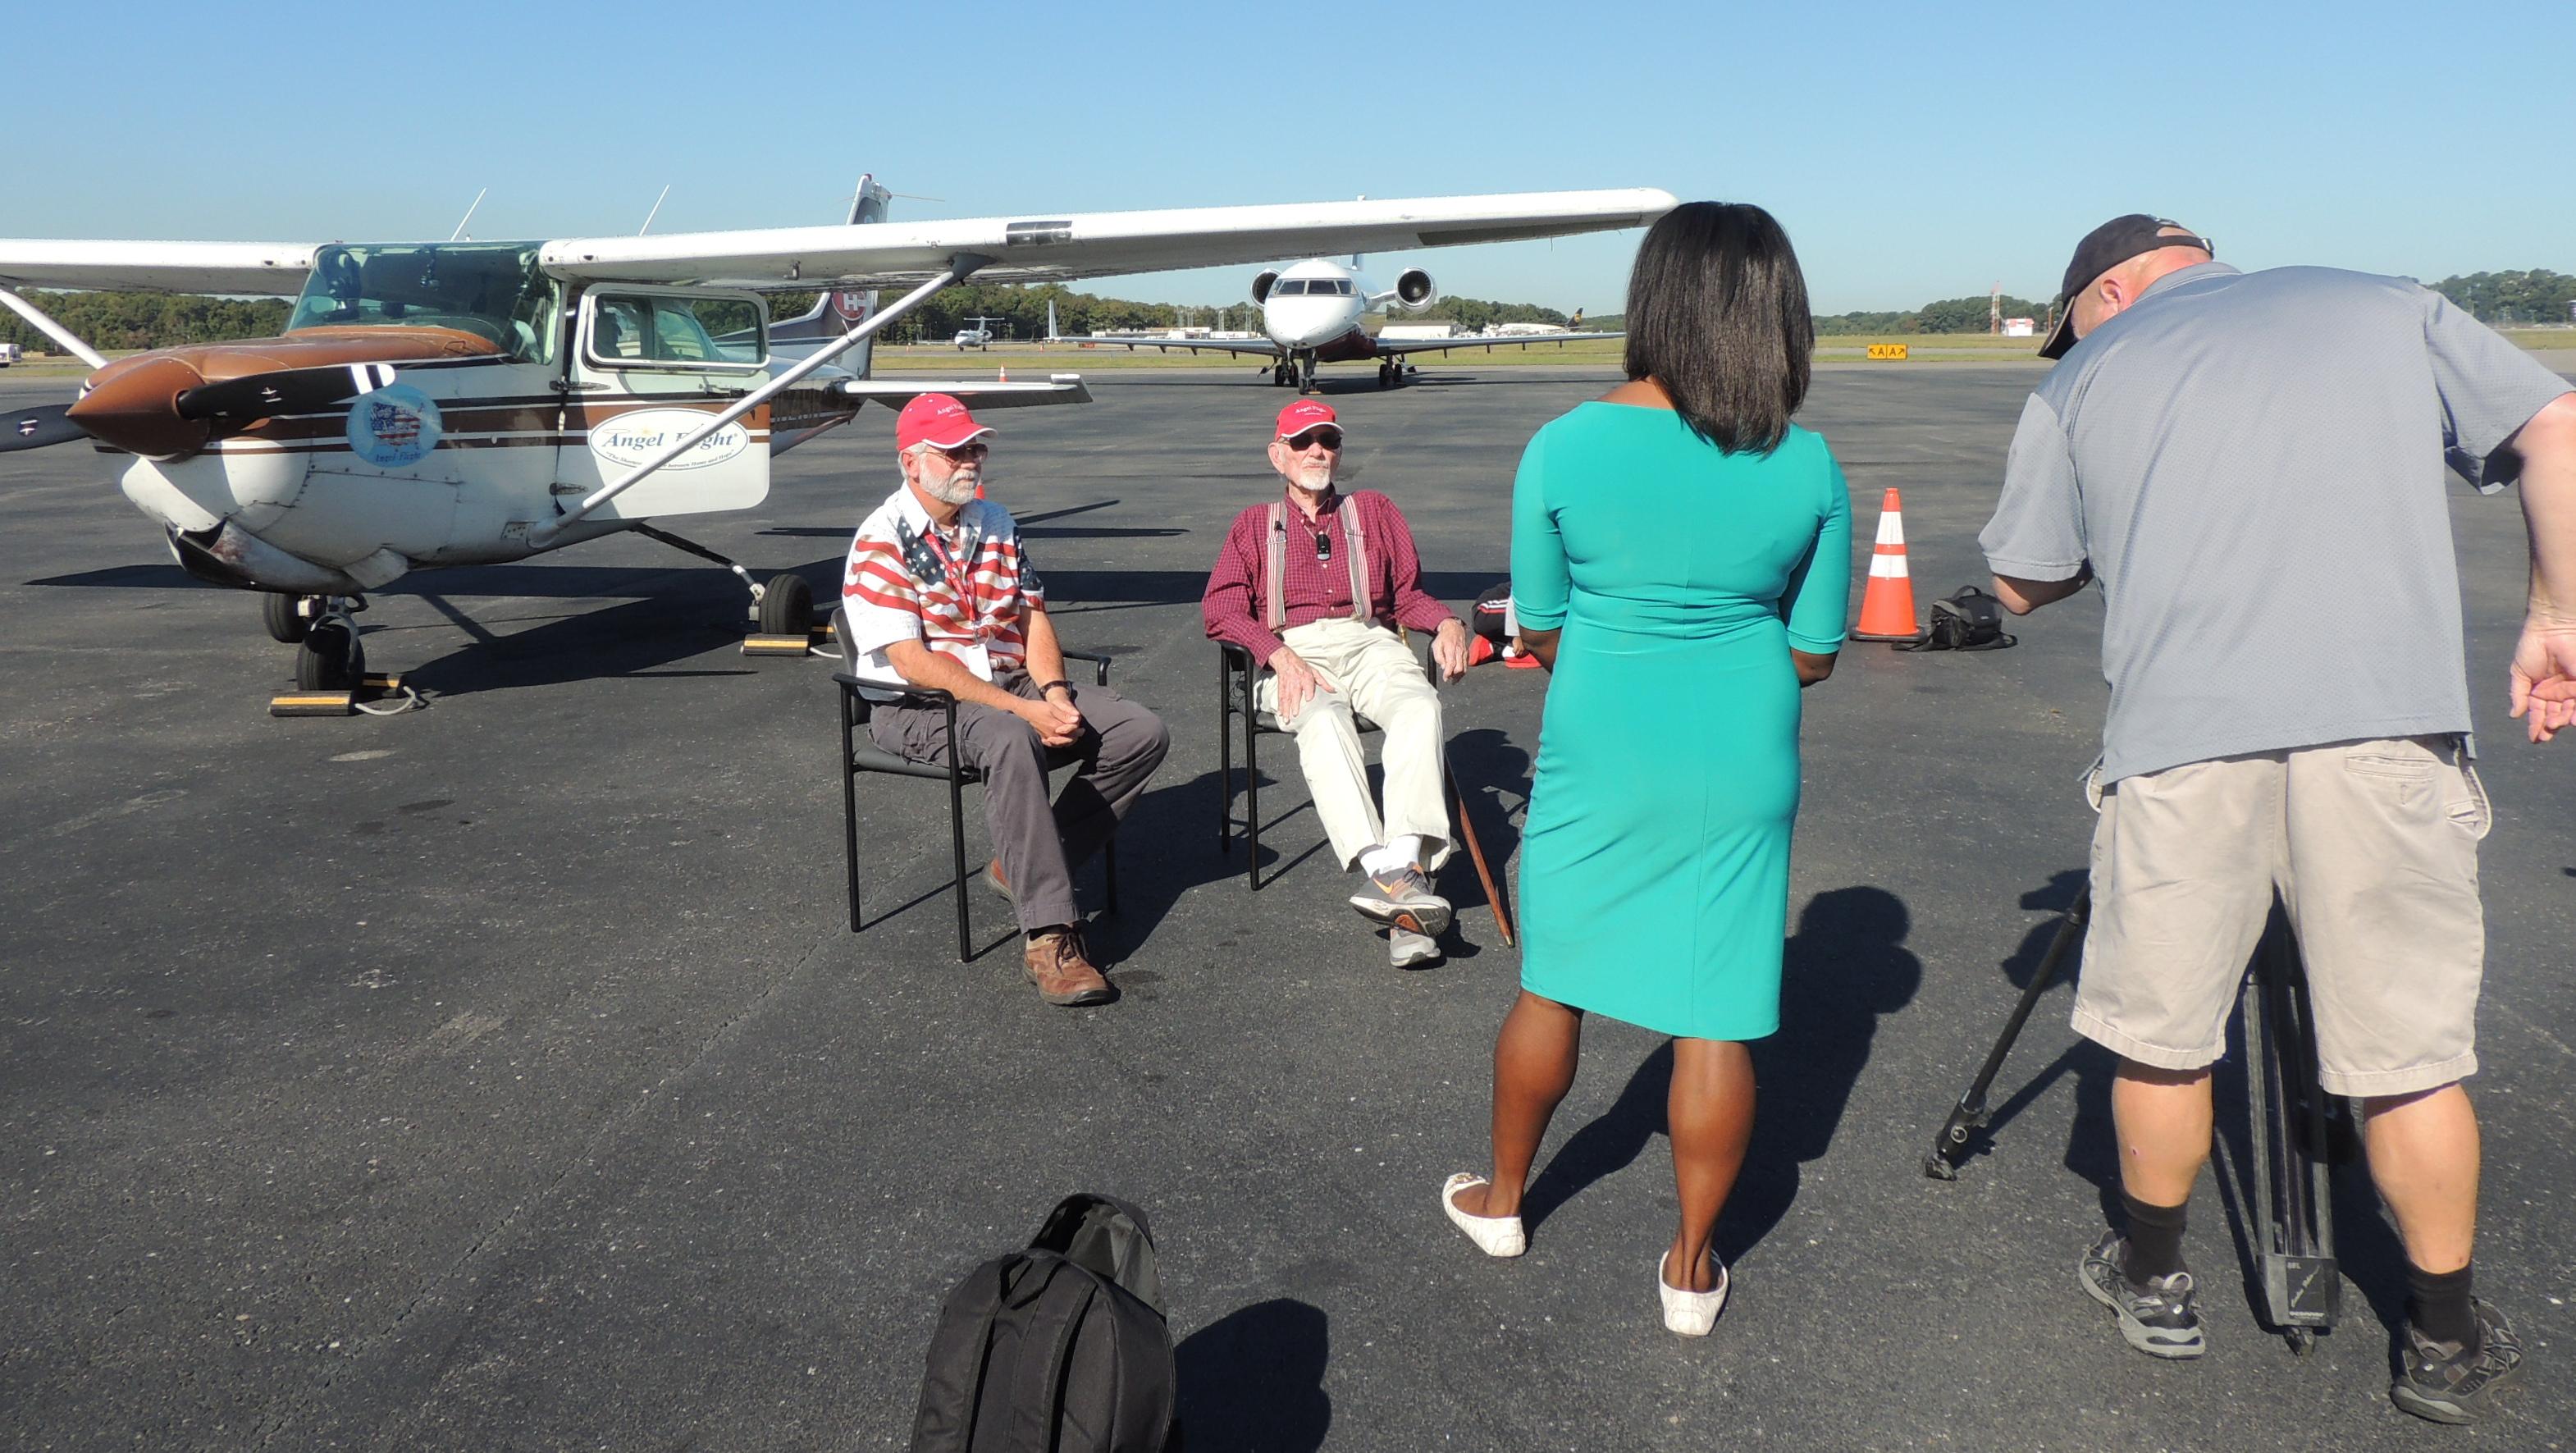 Being Interviewed by WAVY TV 10 Anchor Anita Blanton